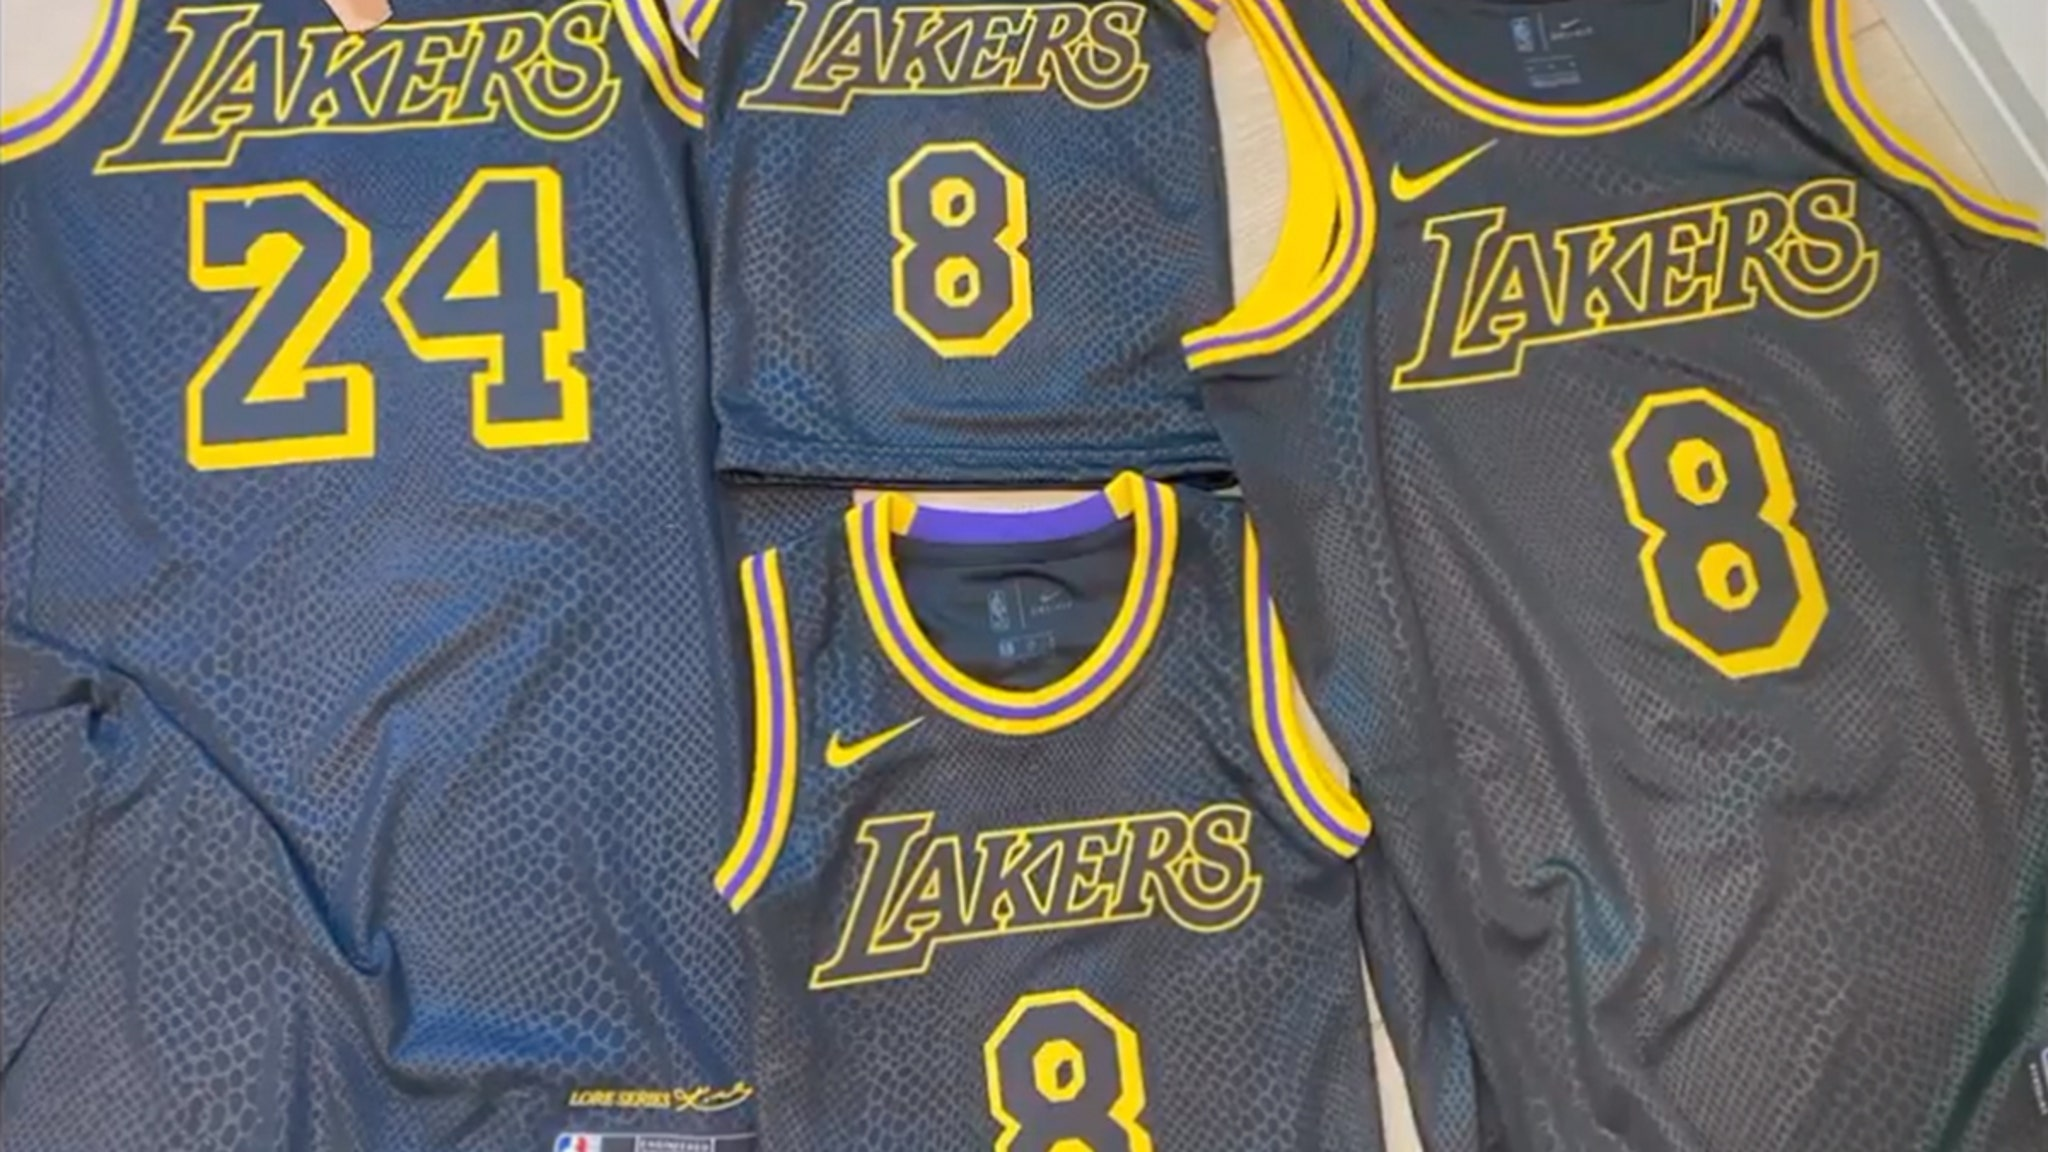 L A Lakers To Wear Kobe Bryant Tribute Jerseys In Nba Playoffs Gigi Patch